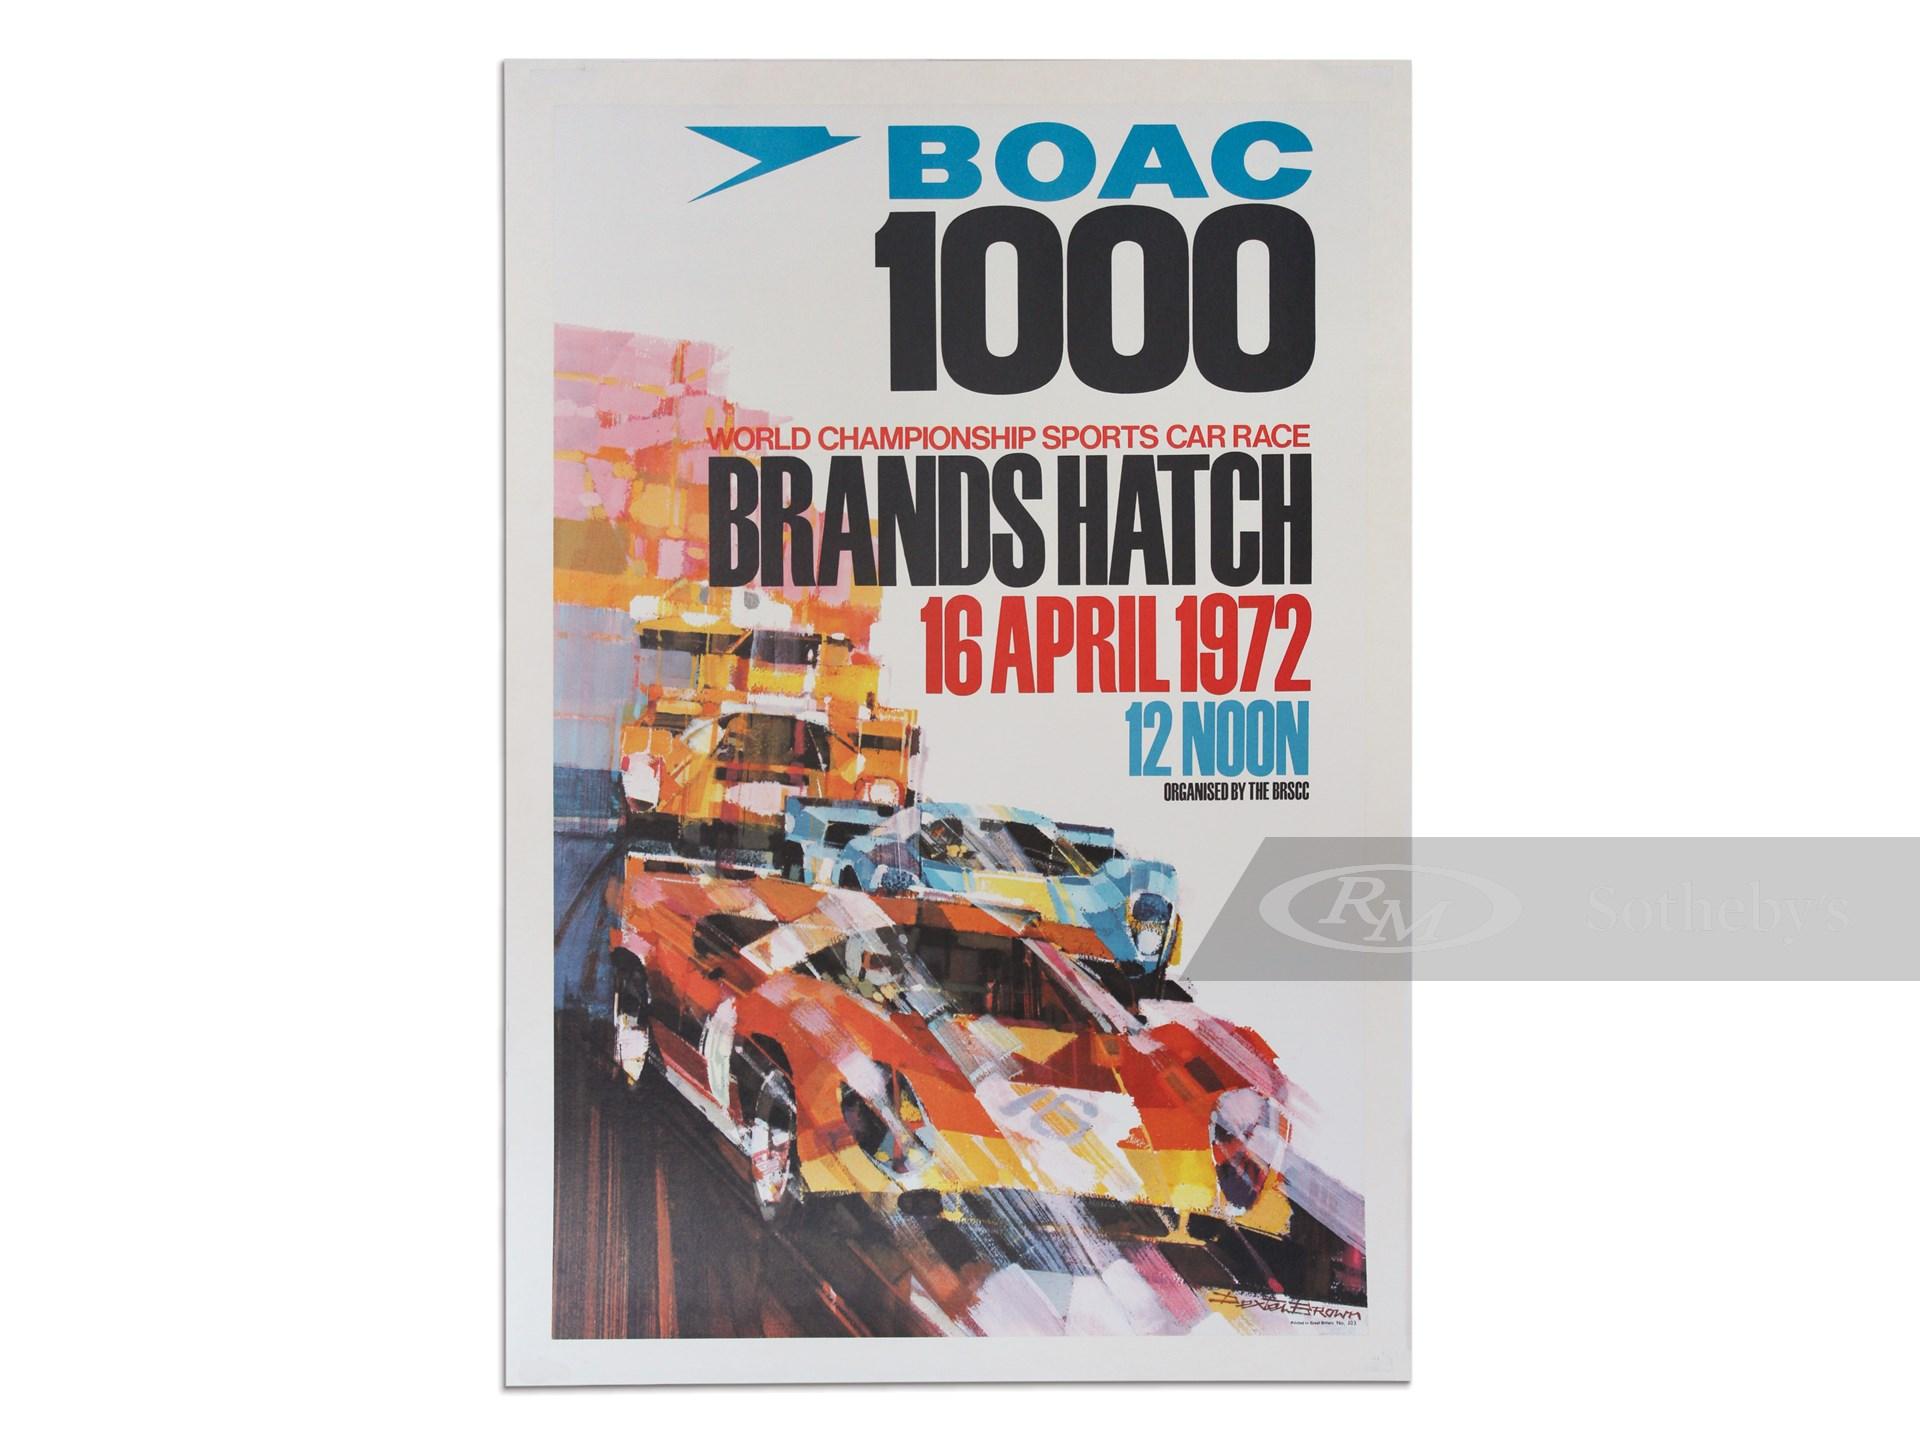 """BOAC 1000 World Championship Sports Car Race Brands Hatch 16 April 1972"" Vintage Event Poster -"